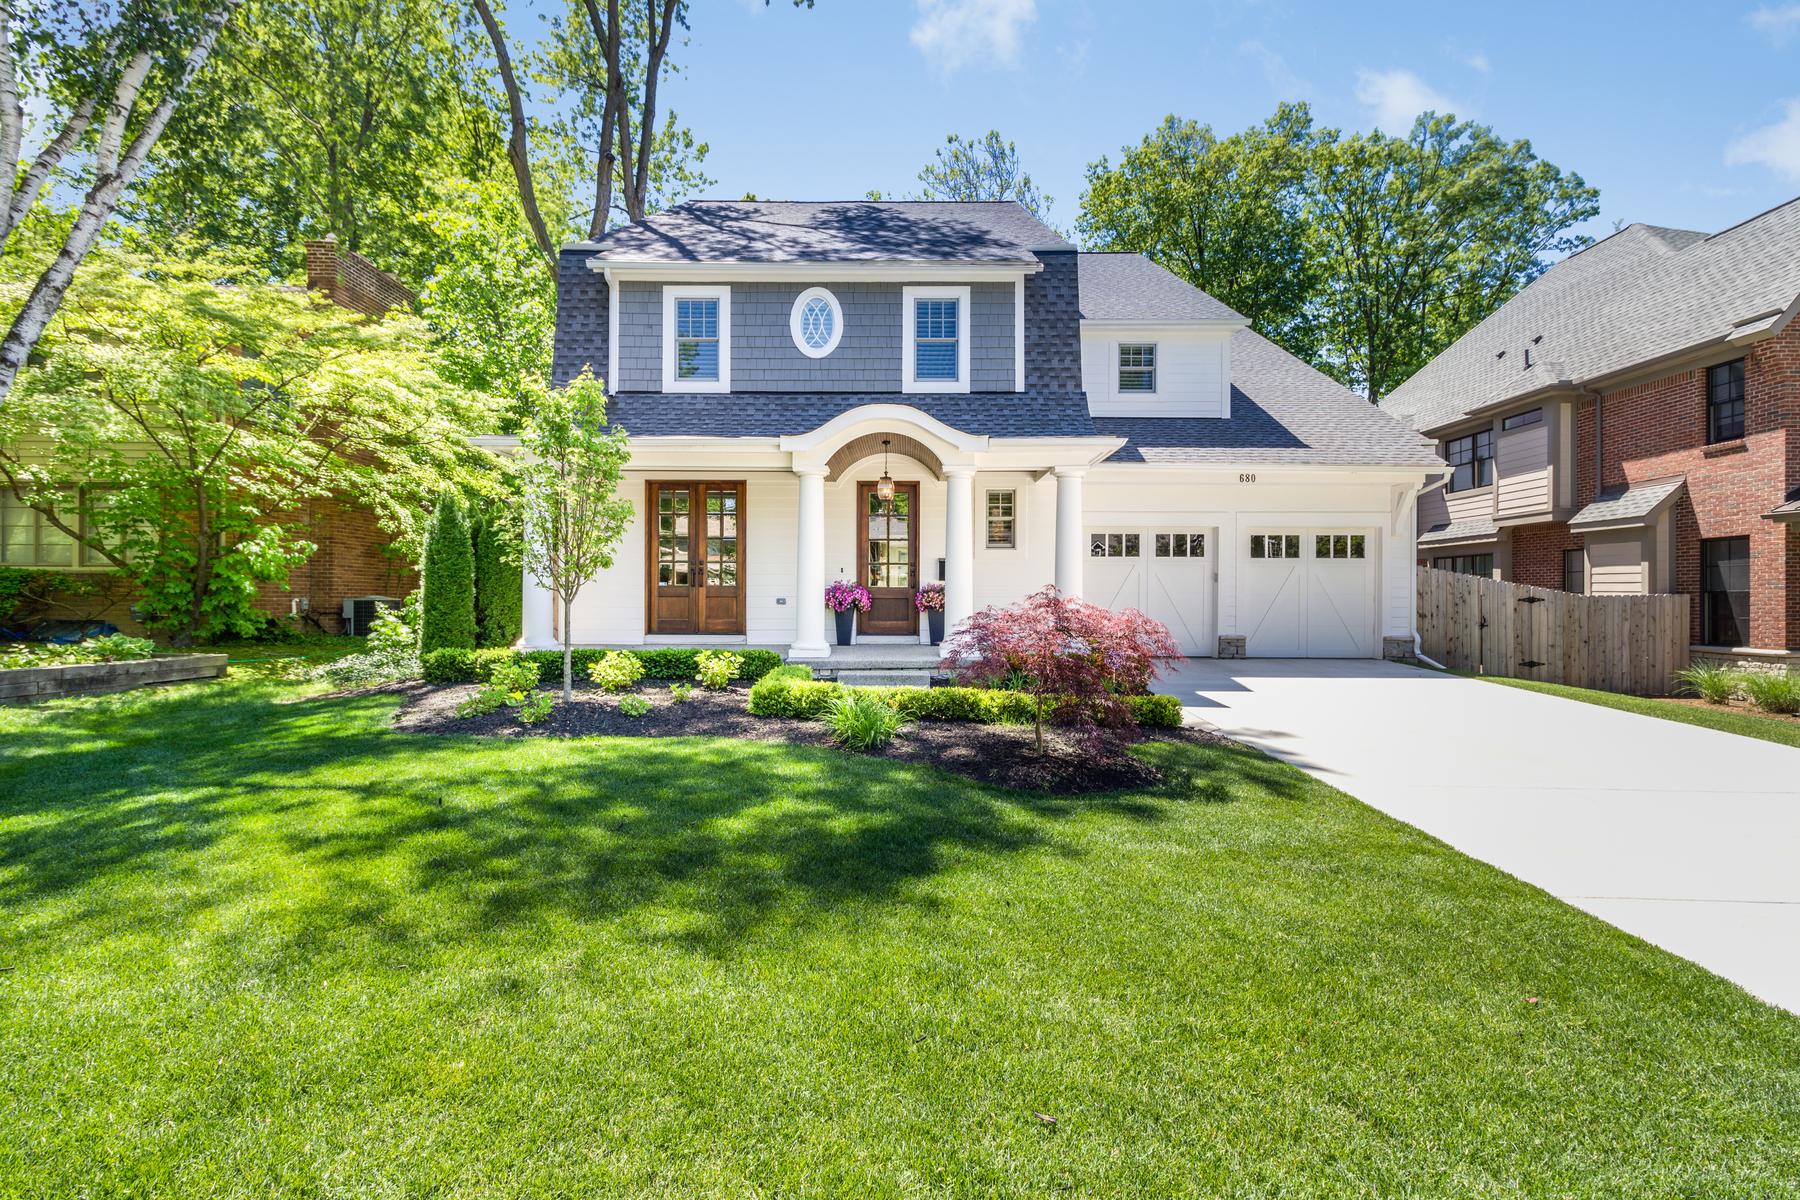 Single Family Homes for Active at Birmingham 680 Shepardbush Street Birmingham, Michigan 48009 United States